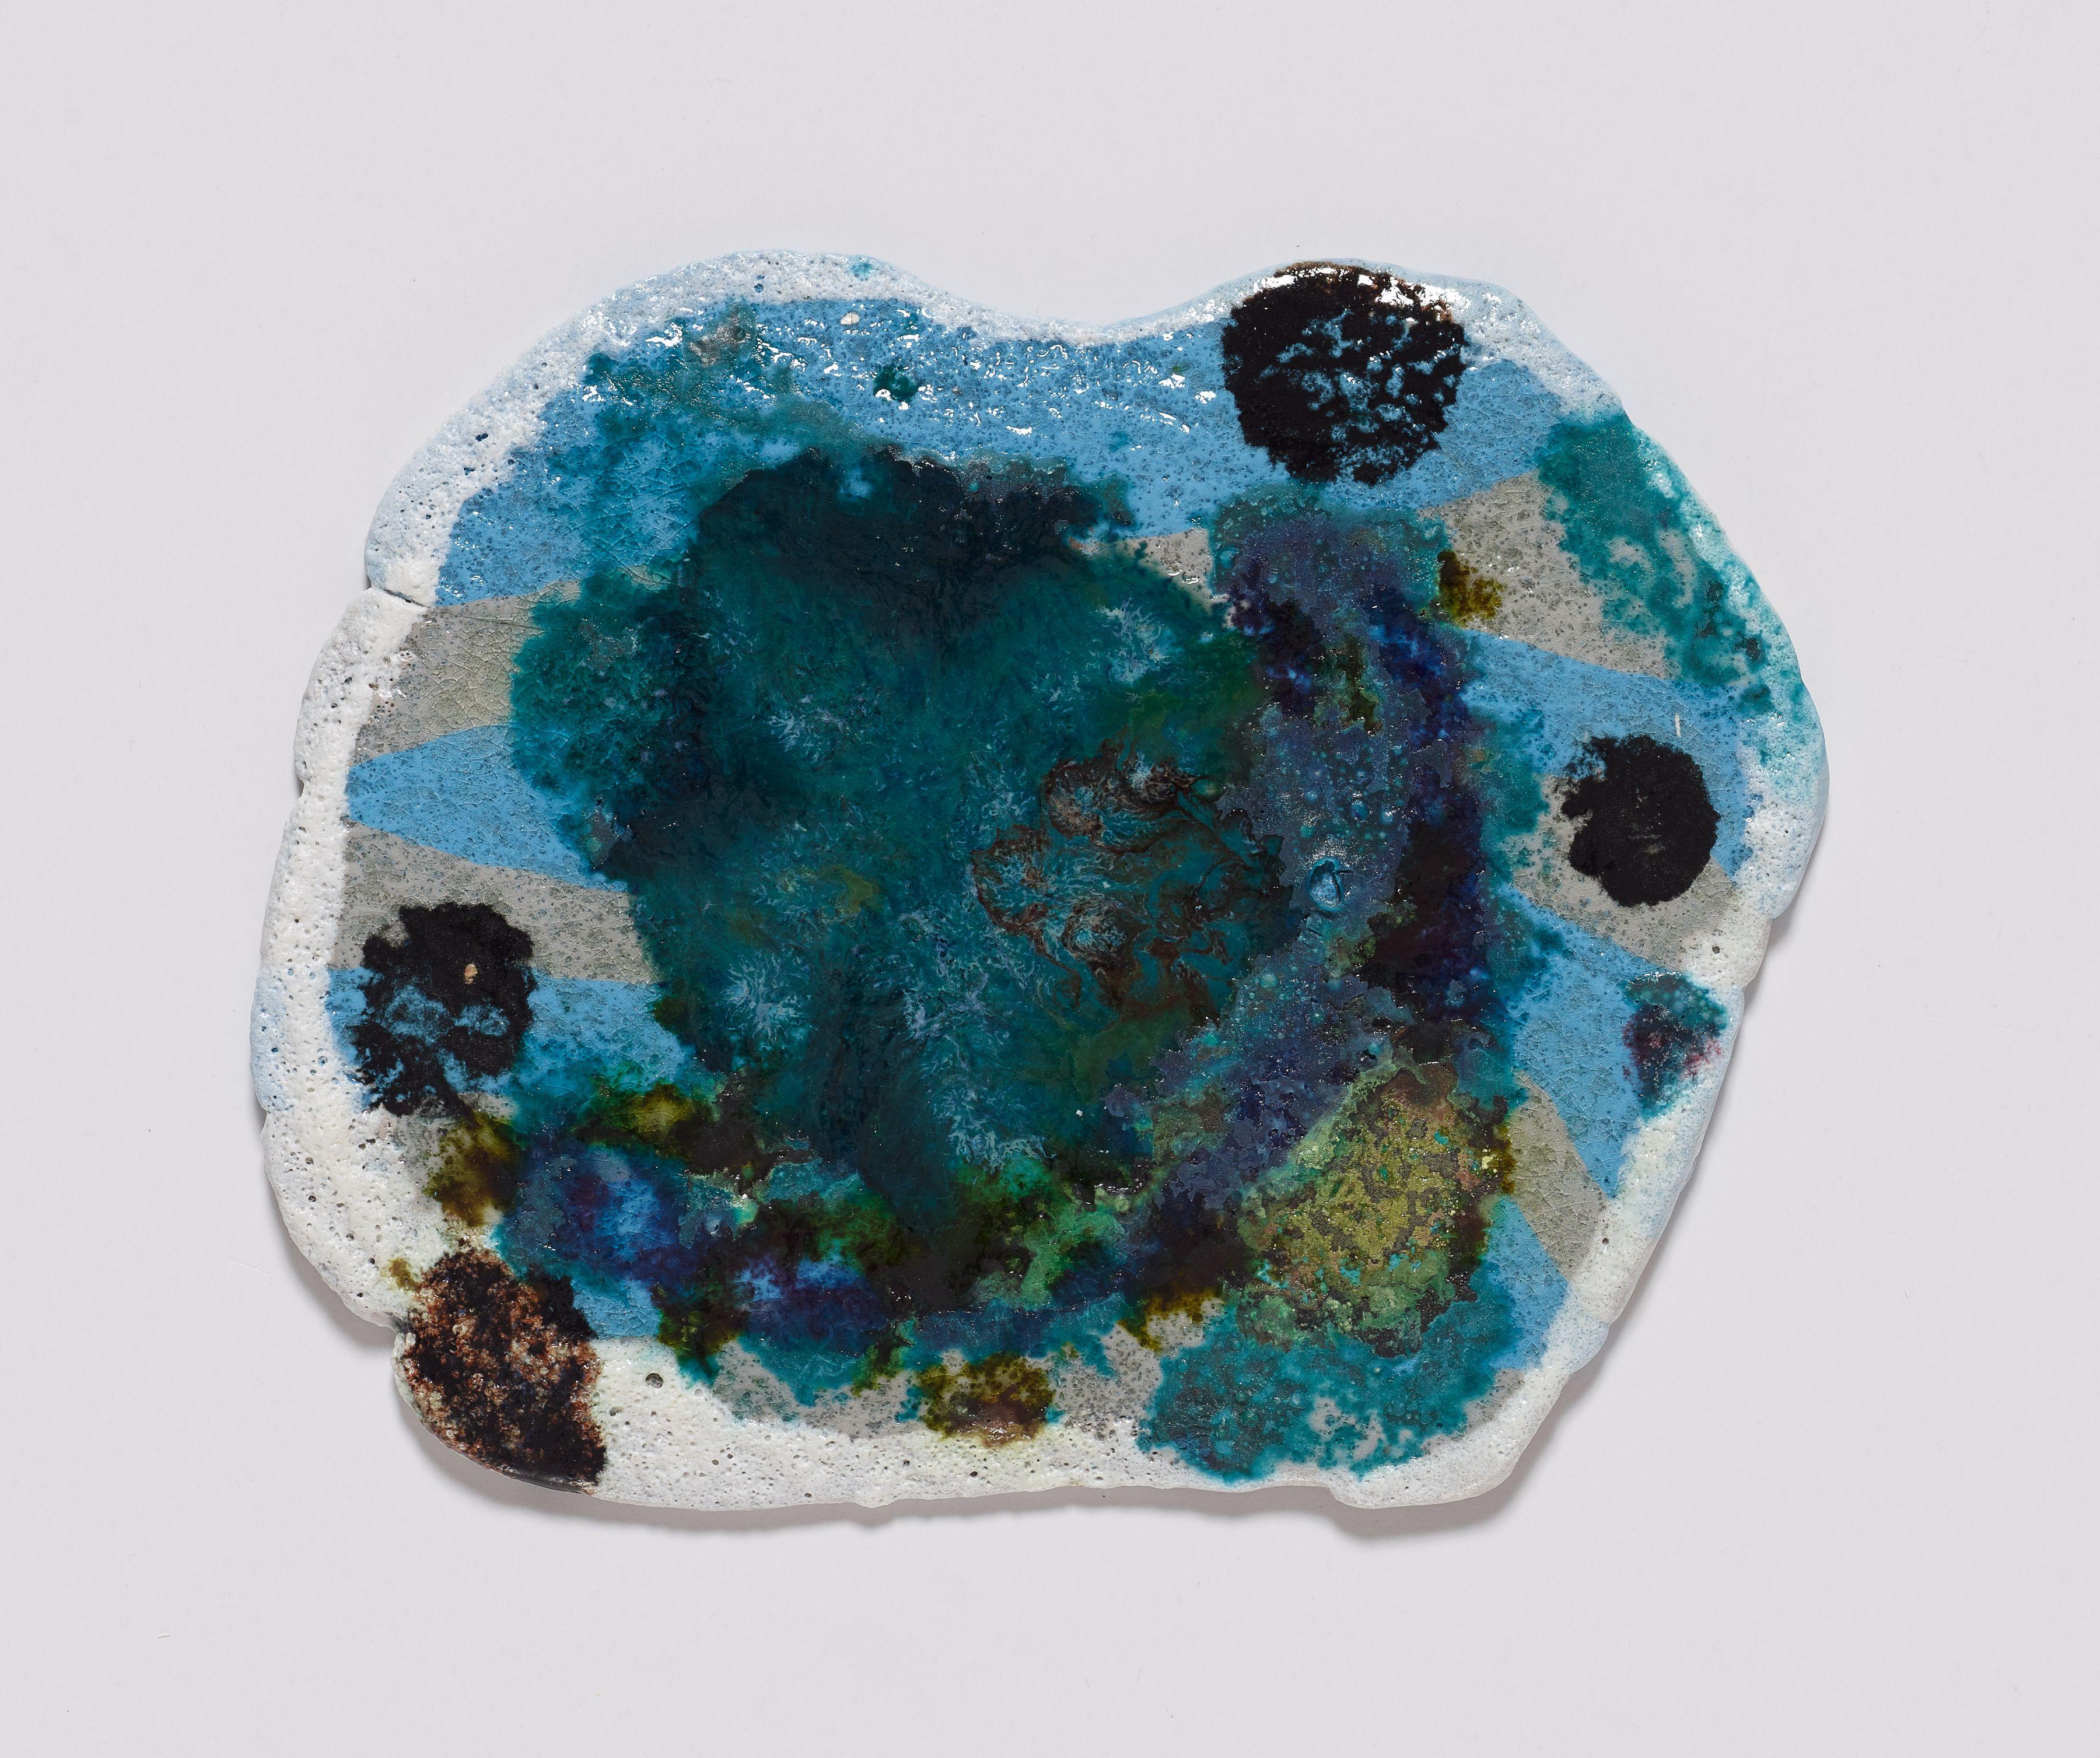 Bonnie, 2014, Colored porcelain and glaze